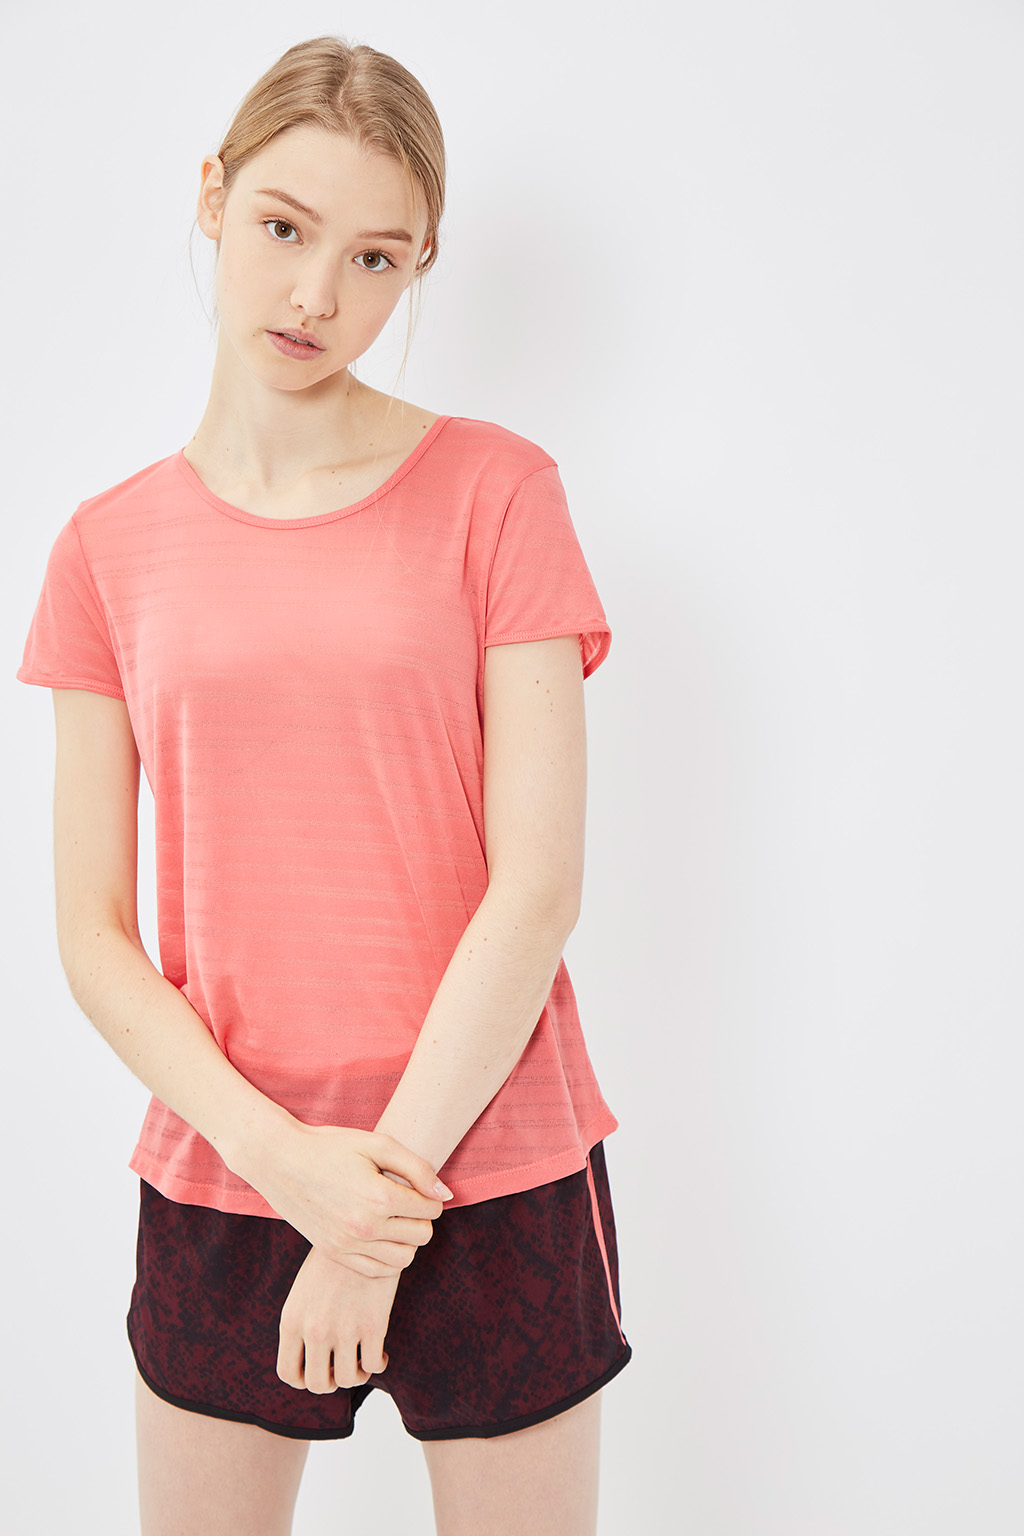 Vente privée femme Oysho lingerie, homewear et sport, t-shirt de sport orange